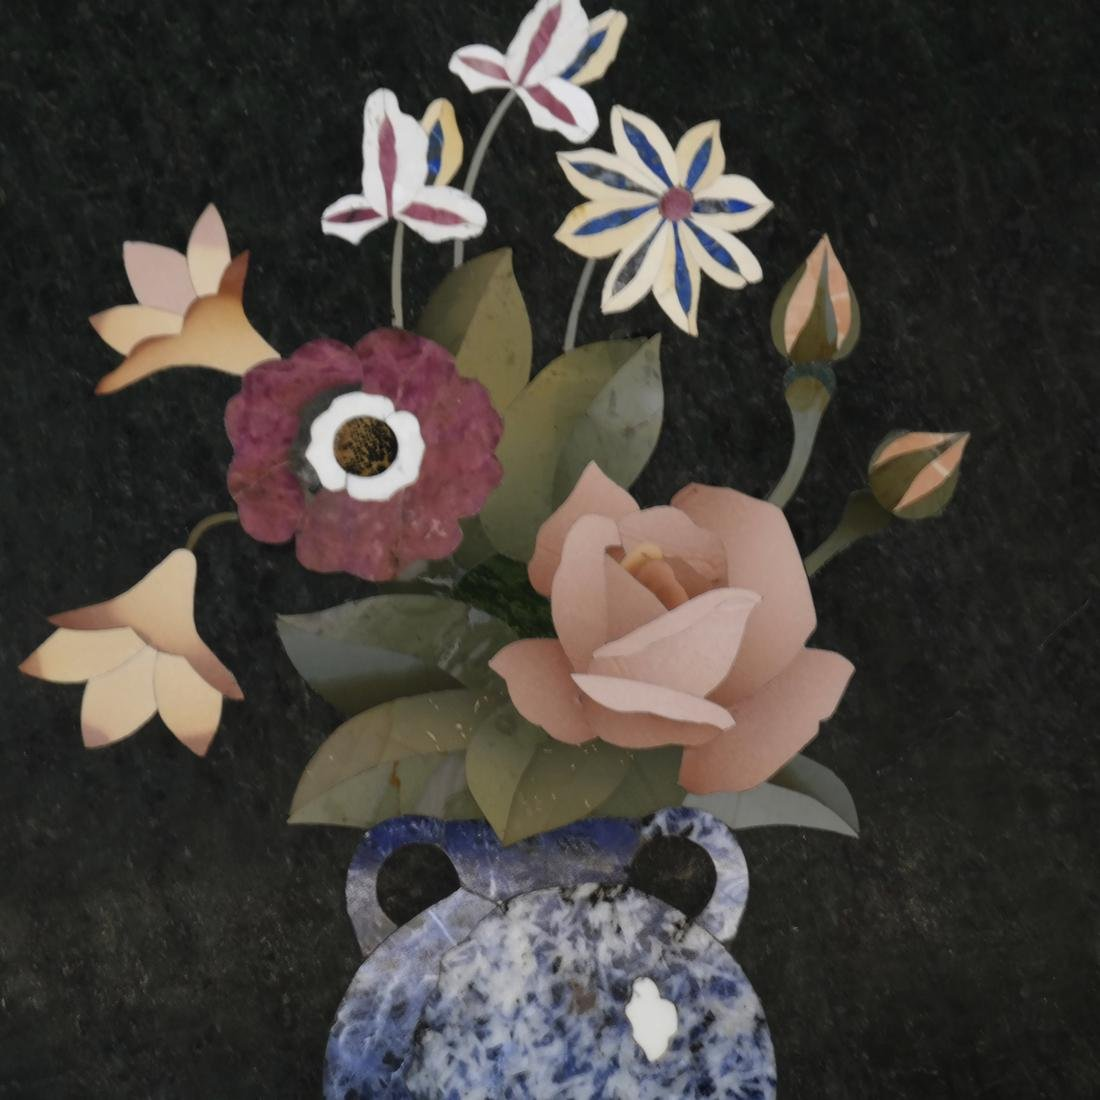 Tarconni Marcos, Floral Still Life - 4